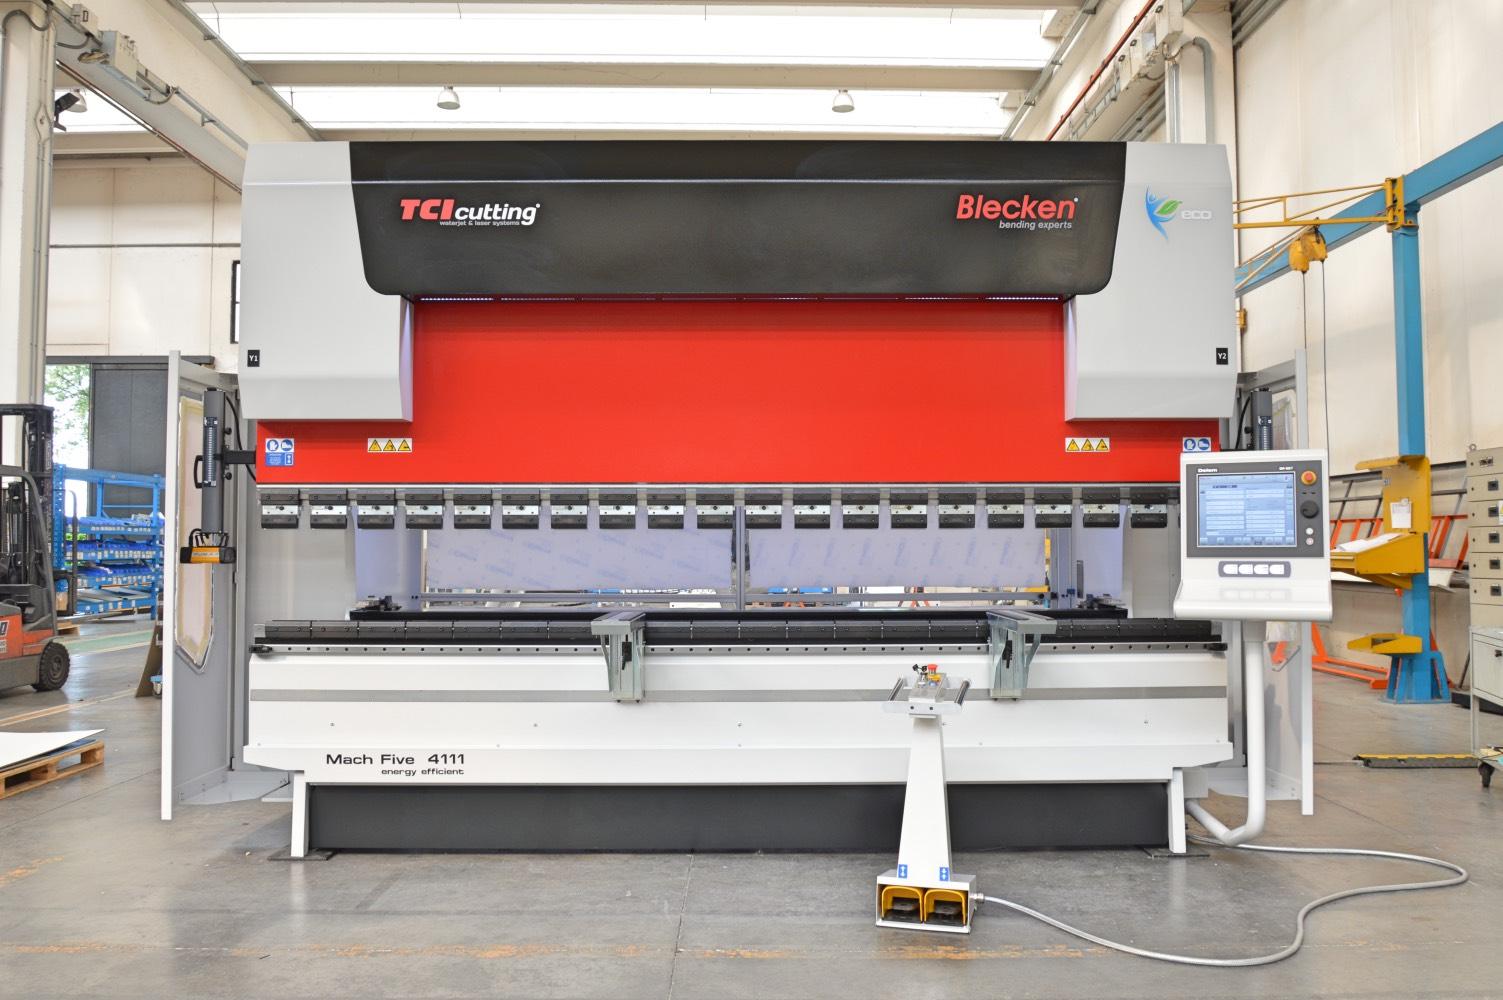 prensa plegadora 110 ton hidráulica lista para entrega